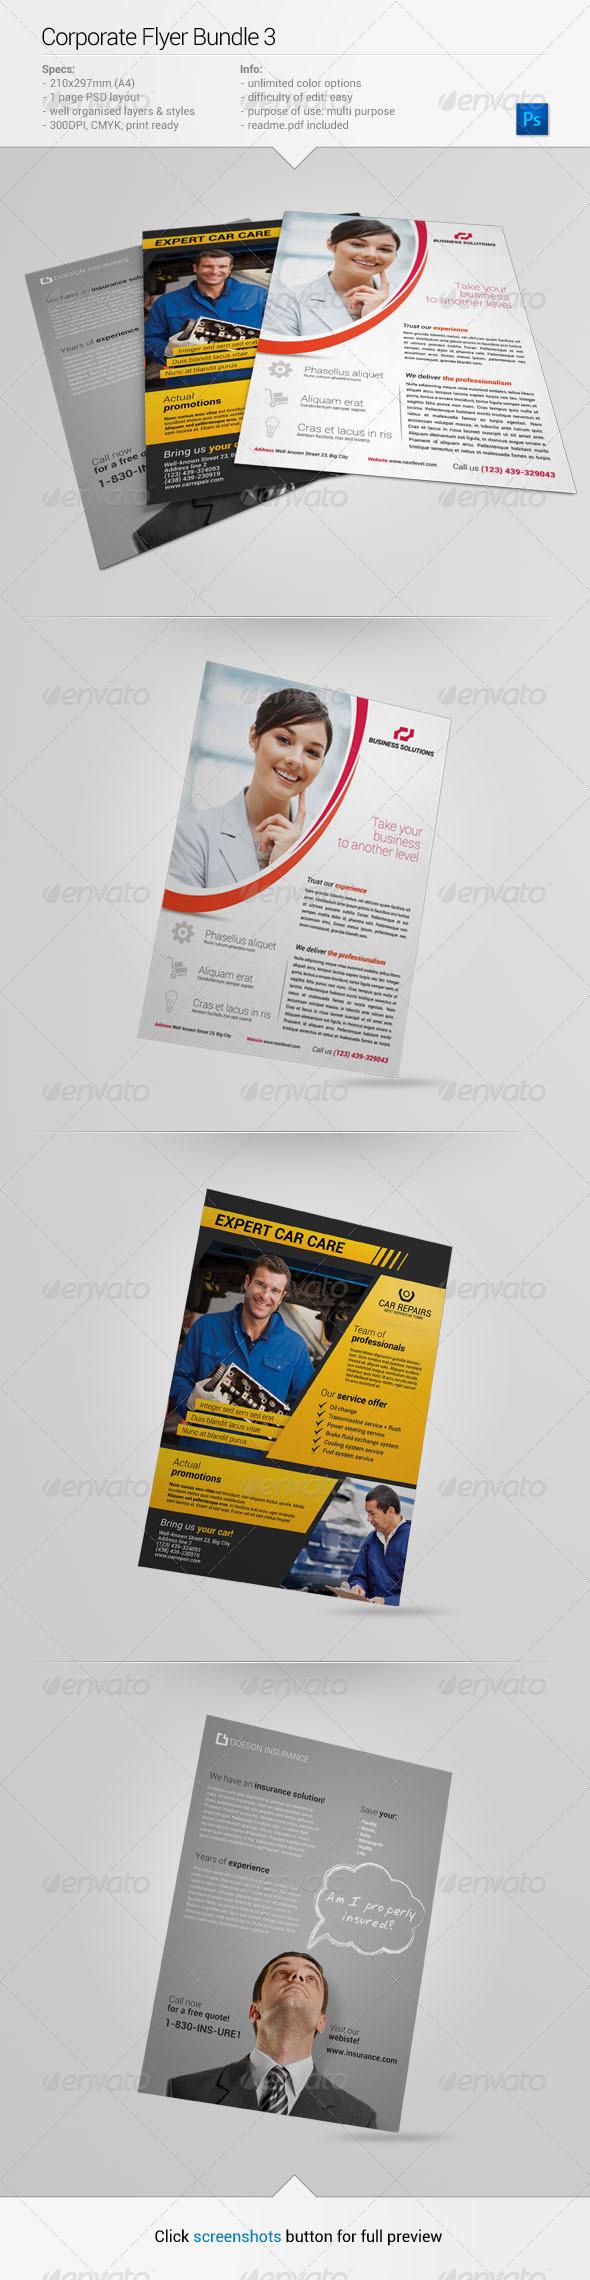 GraphicRiver Corporate Flyer Bundle 3 6714209